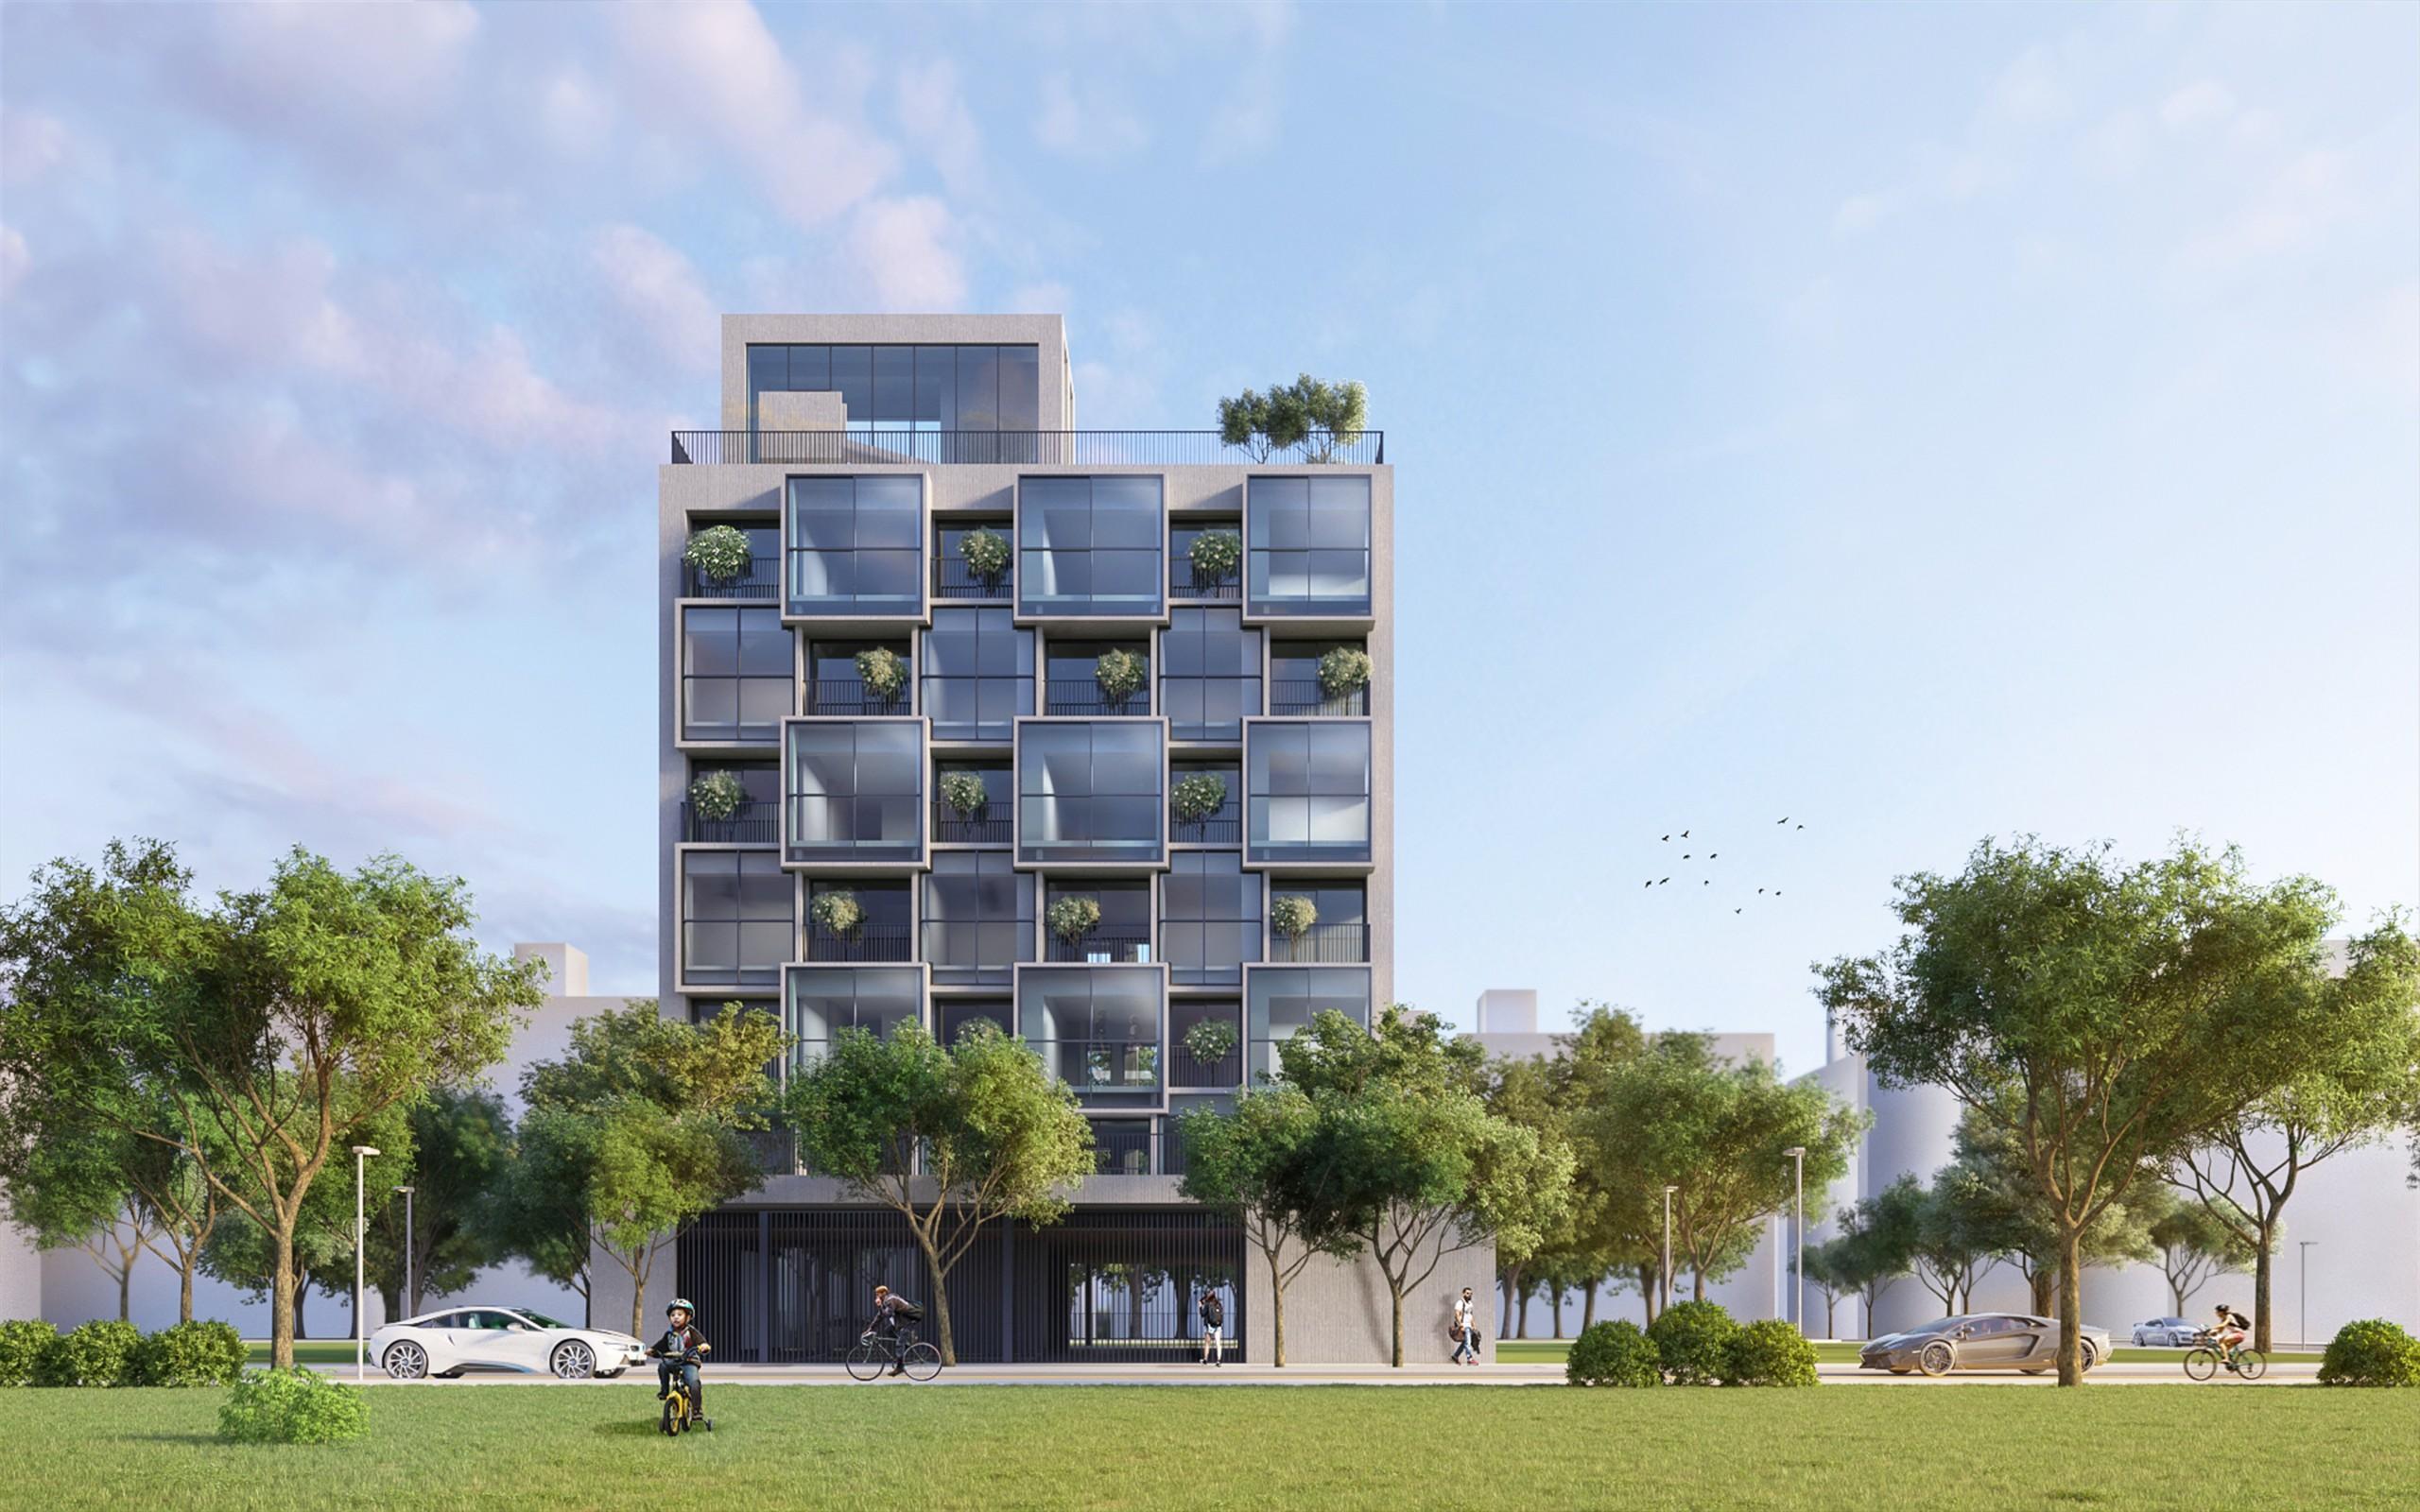 德築-DEZU-project-林口十現-architecture-building-3Drendering-2